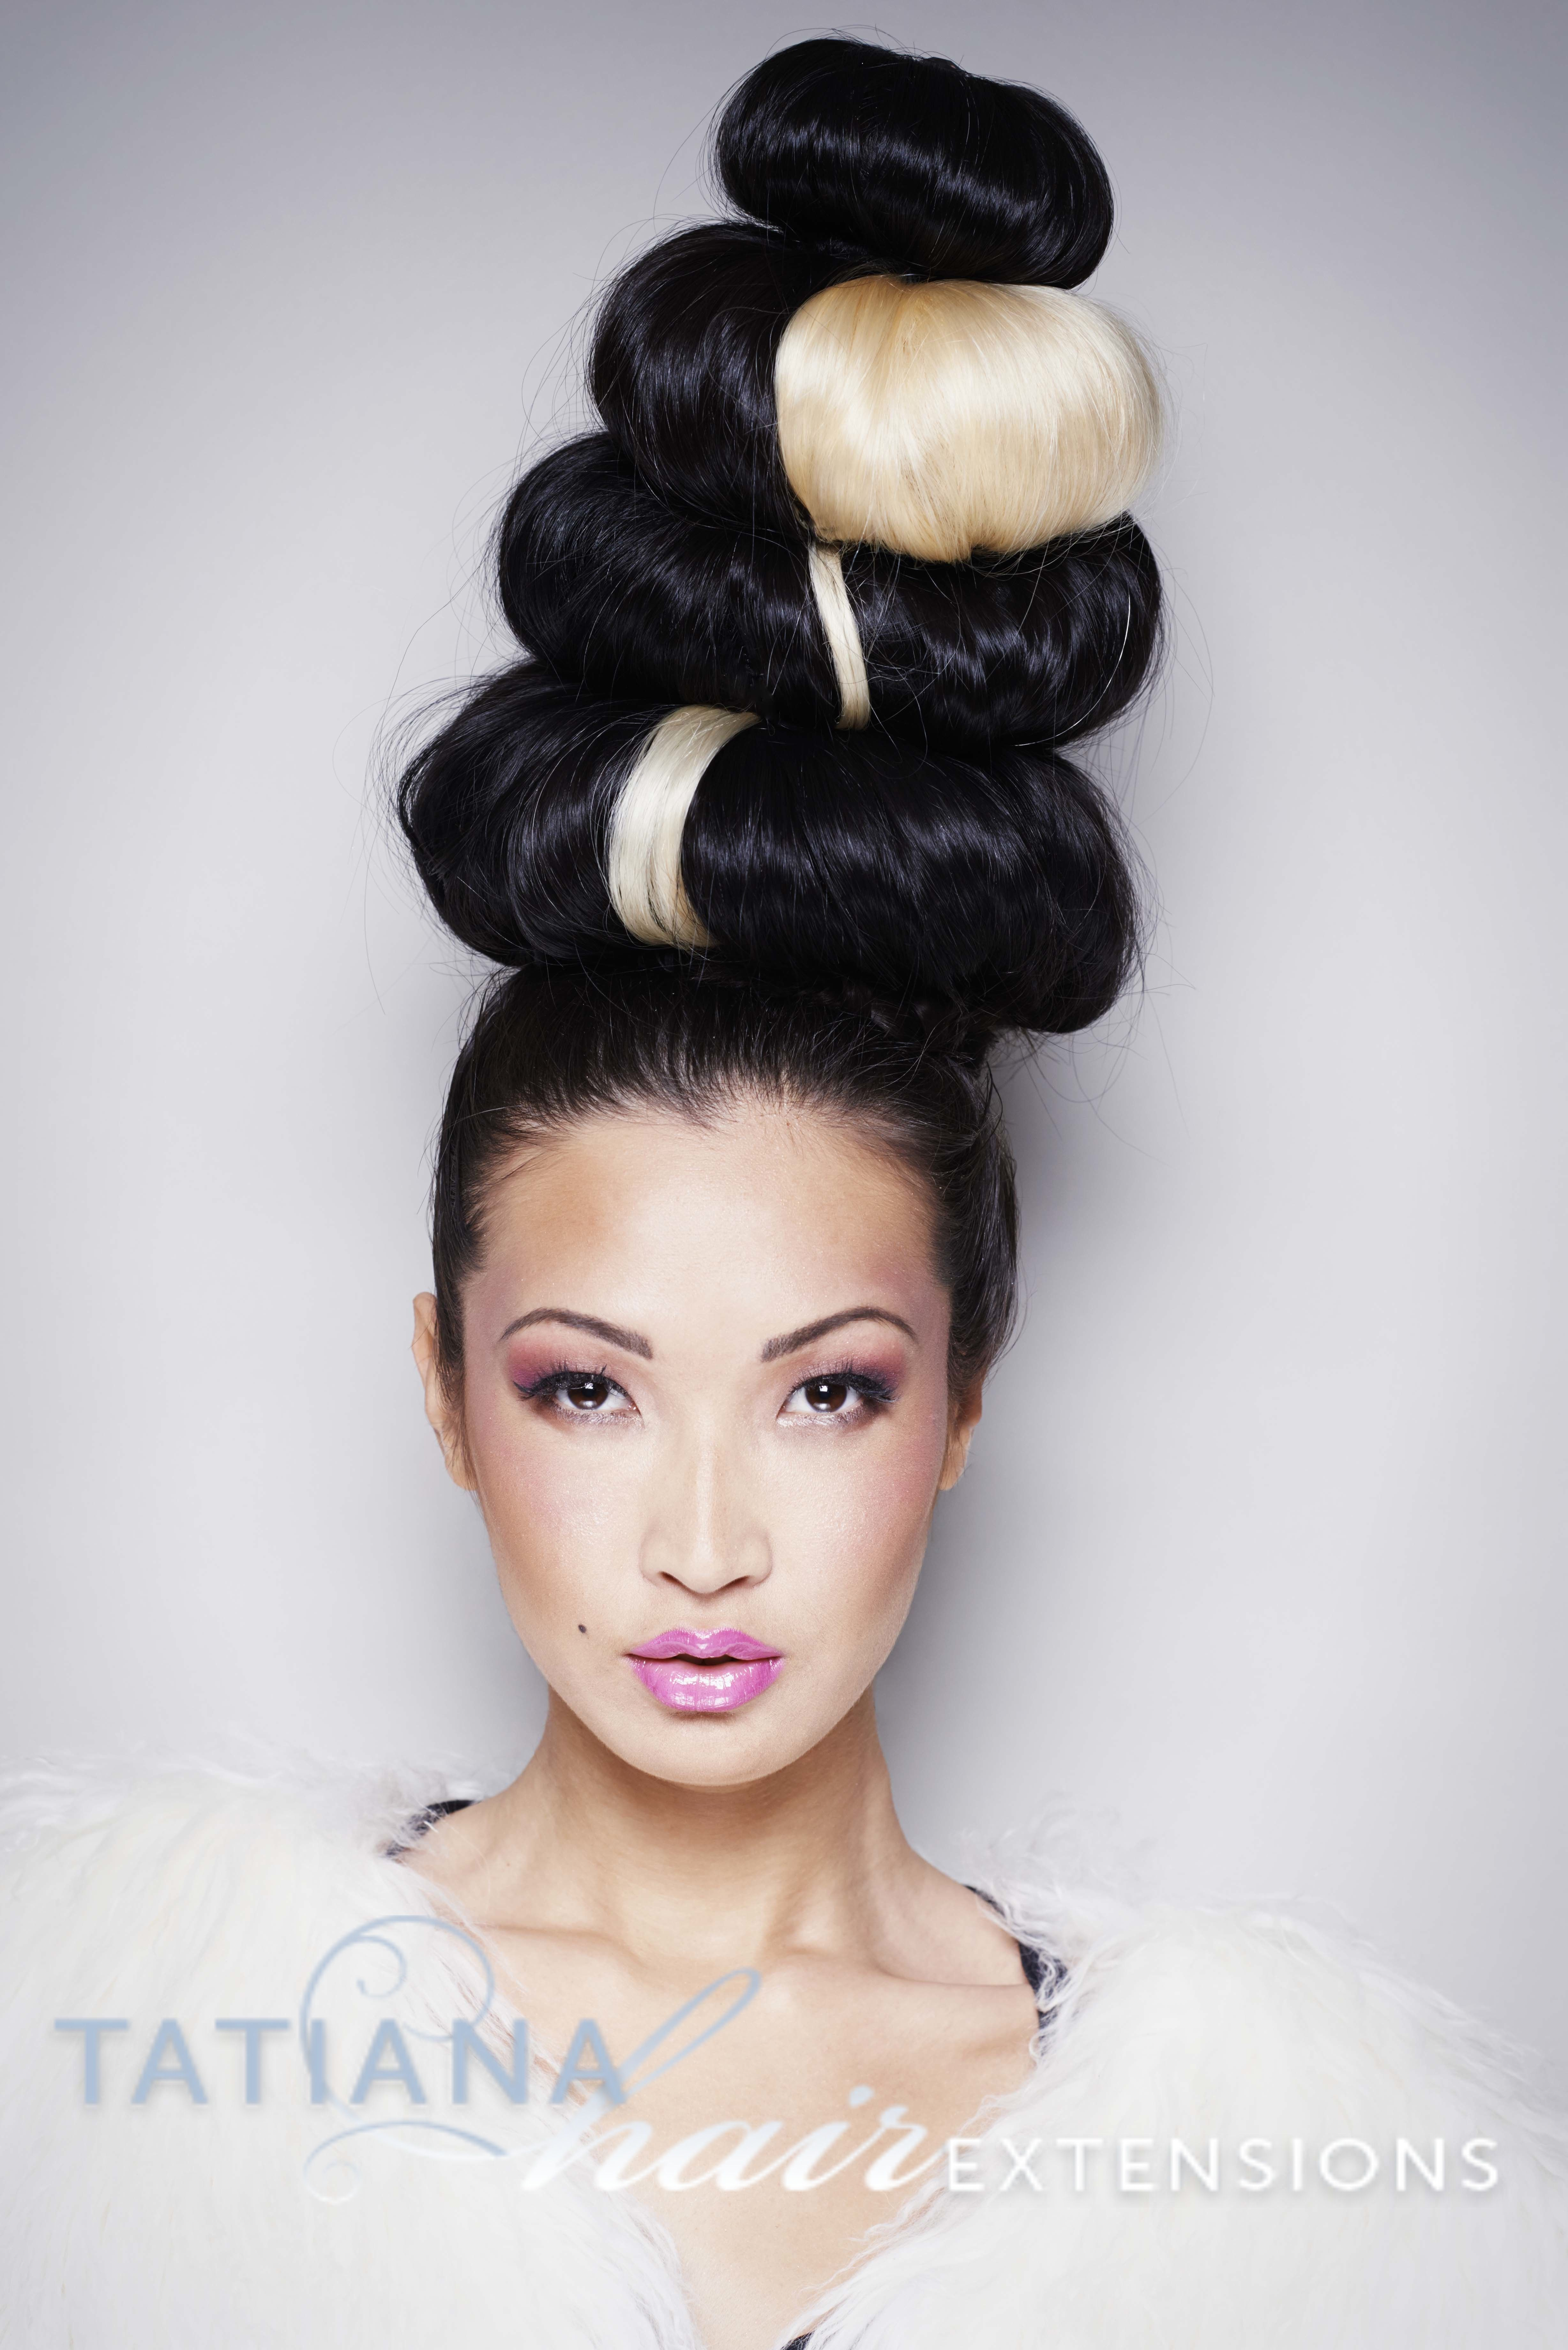 avant garde hair. hairstyle byn#tatianahairextensions using hair